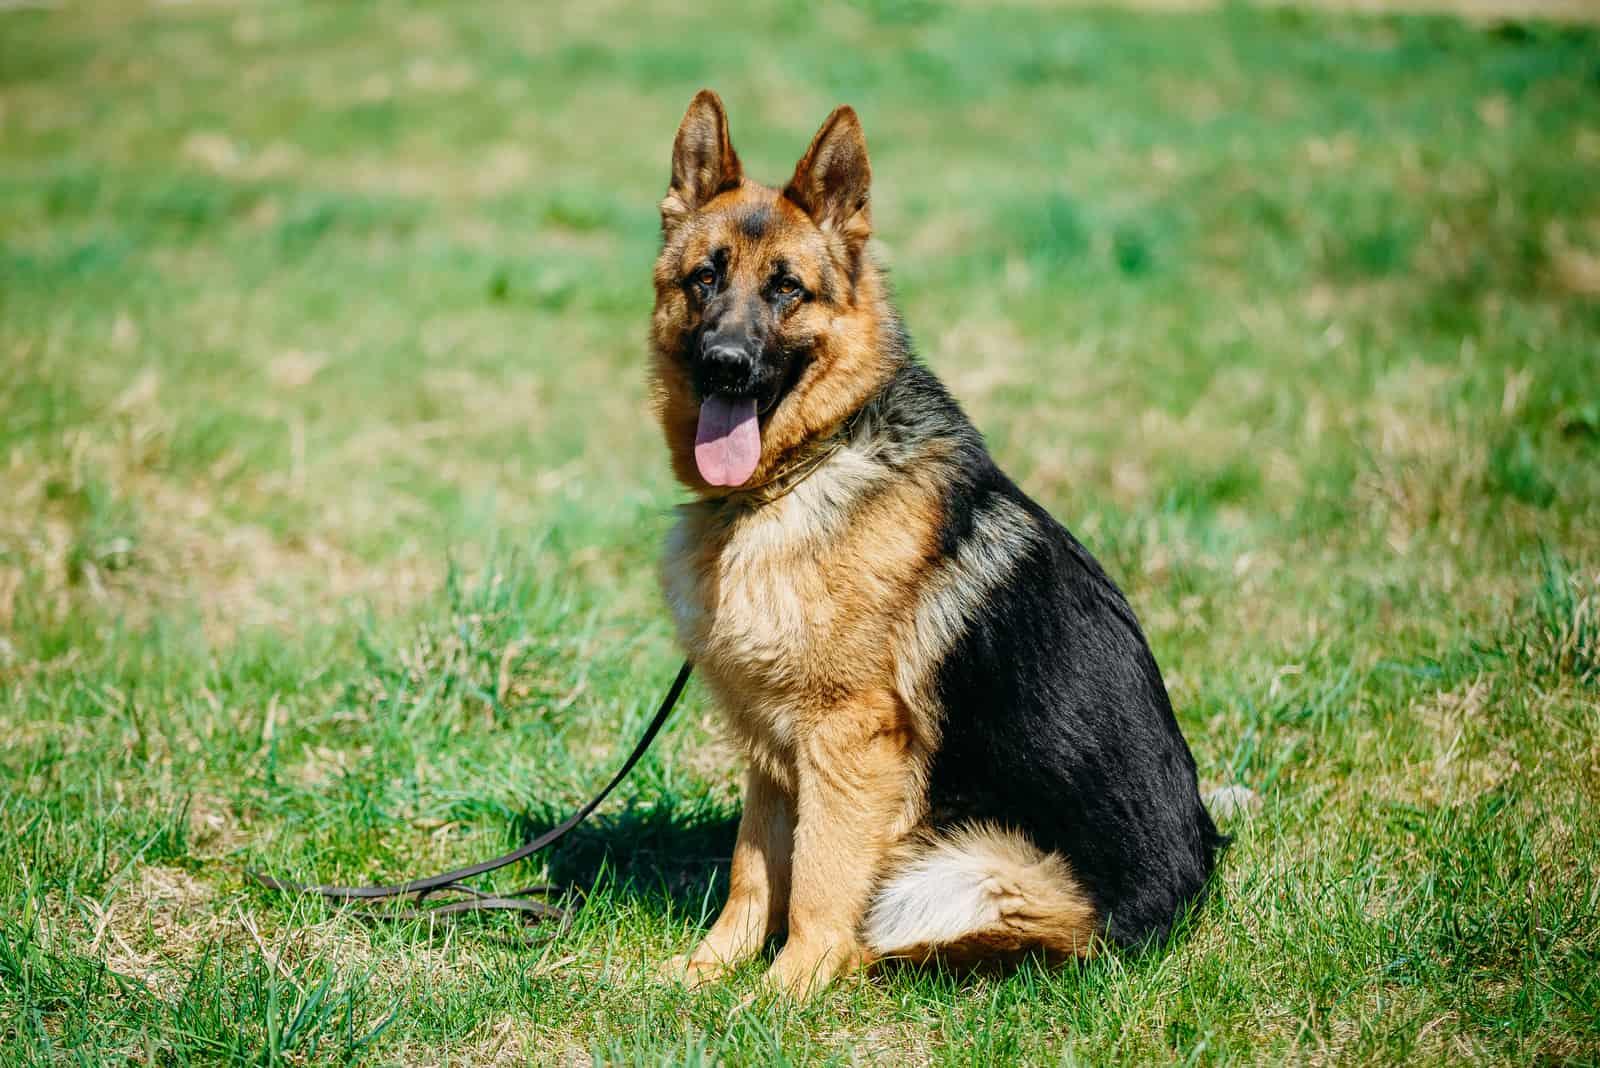 Young Brown German Shepherd Dog